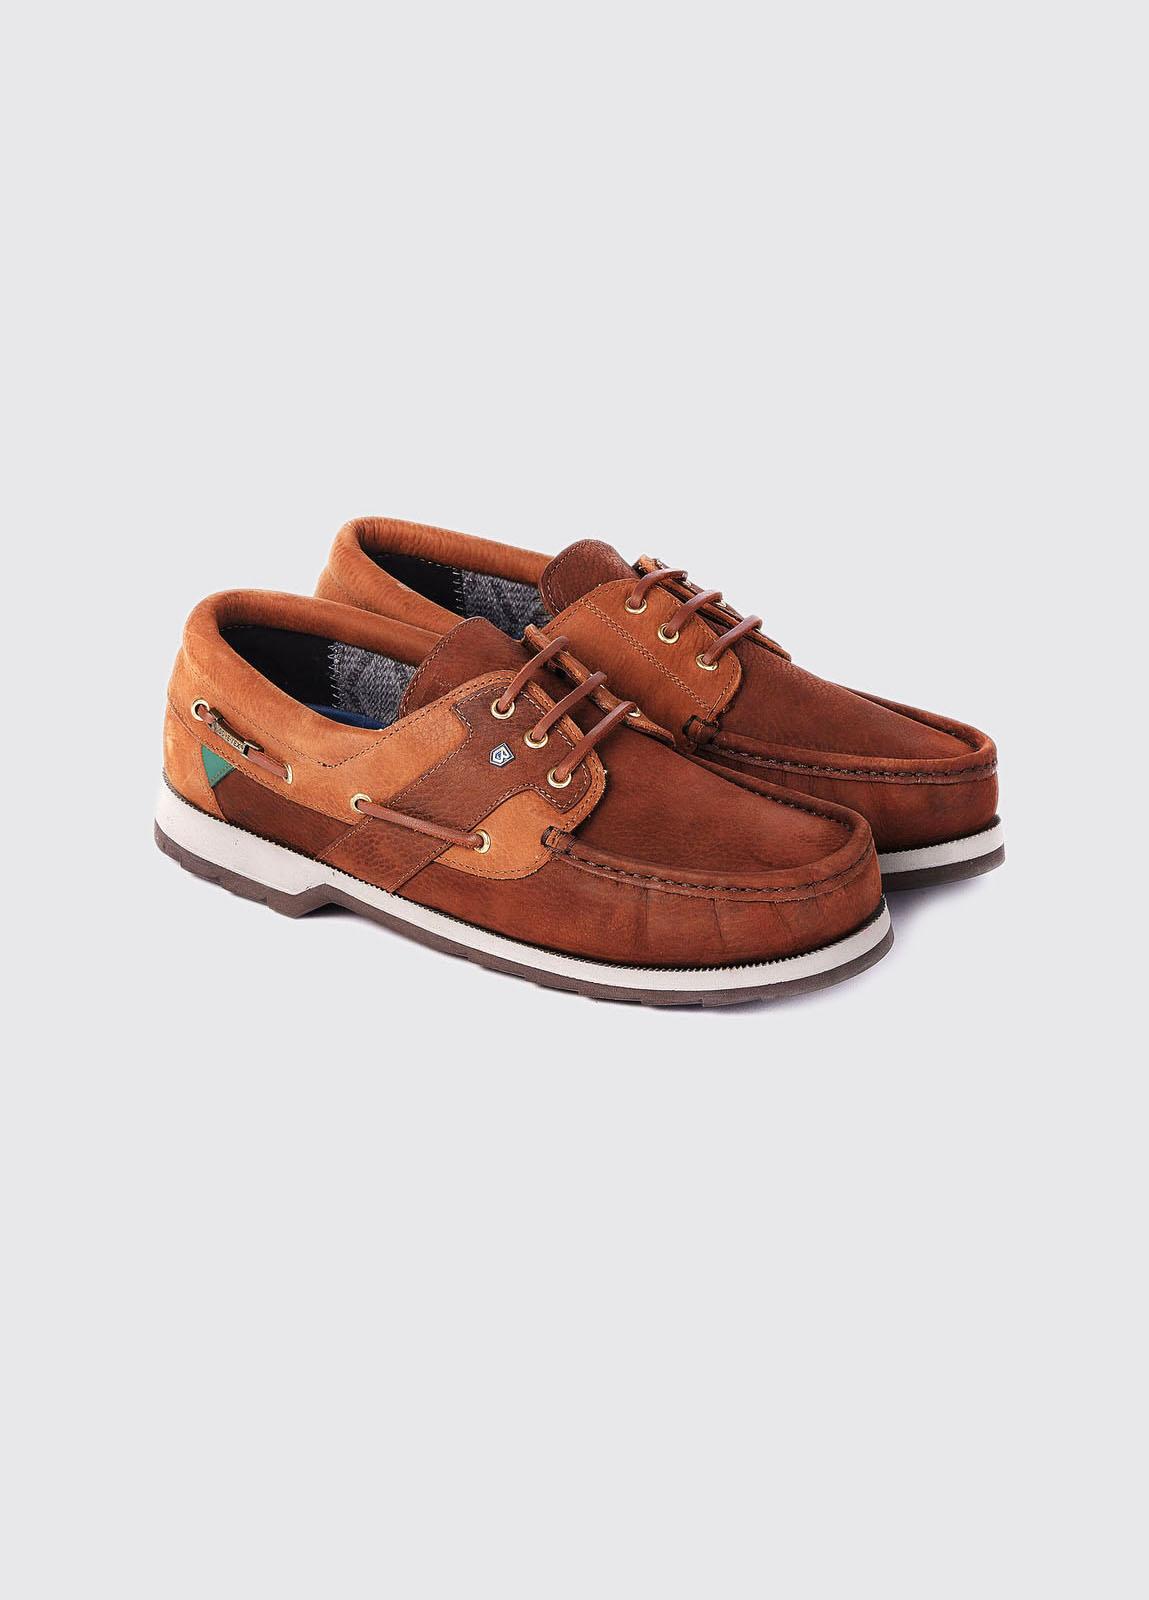 Clipper Deck Shoe - Brown